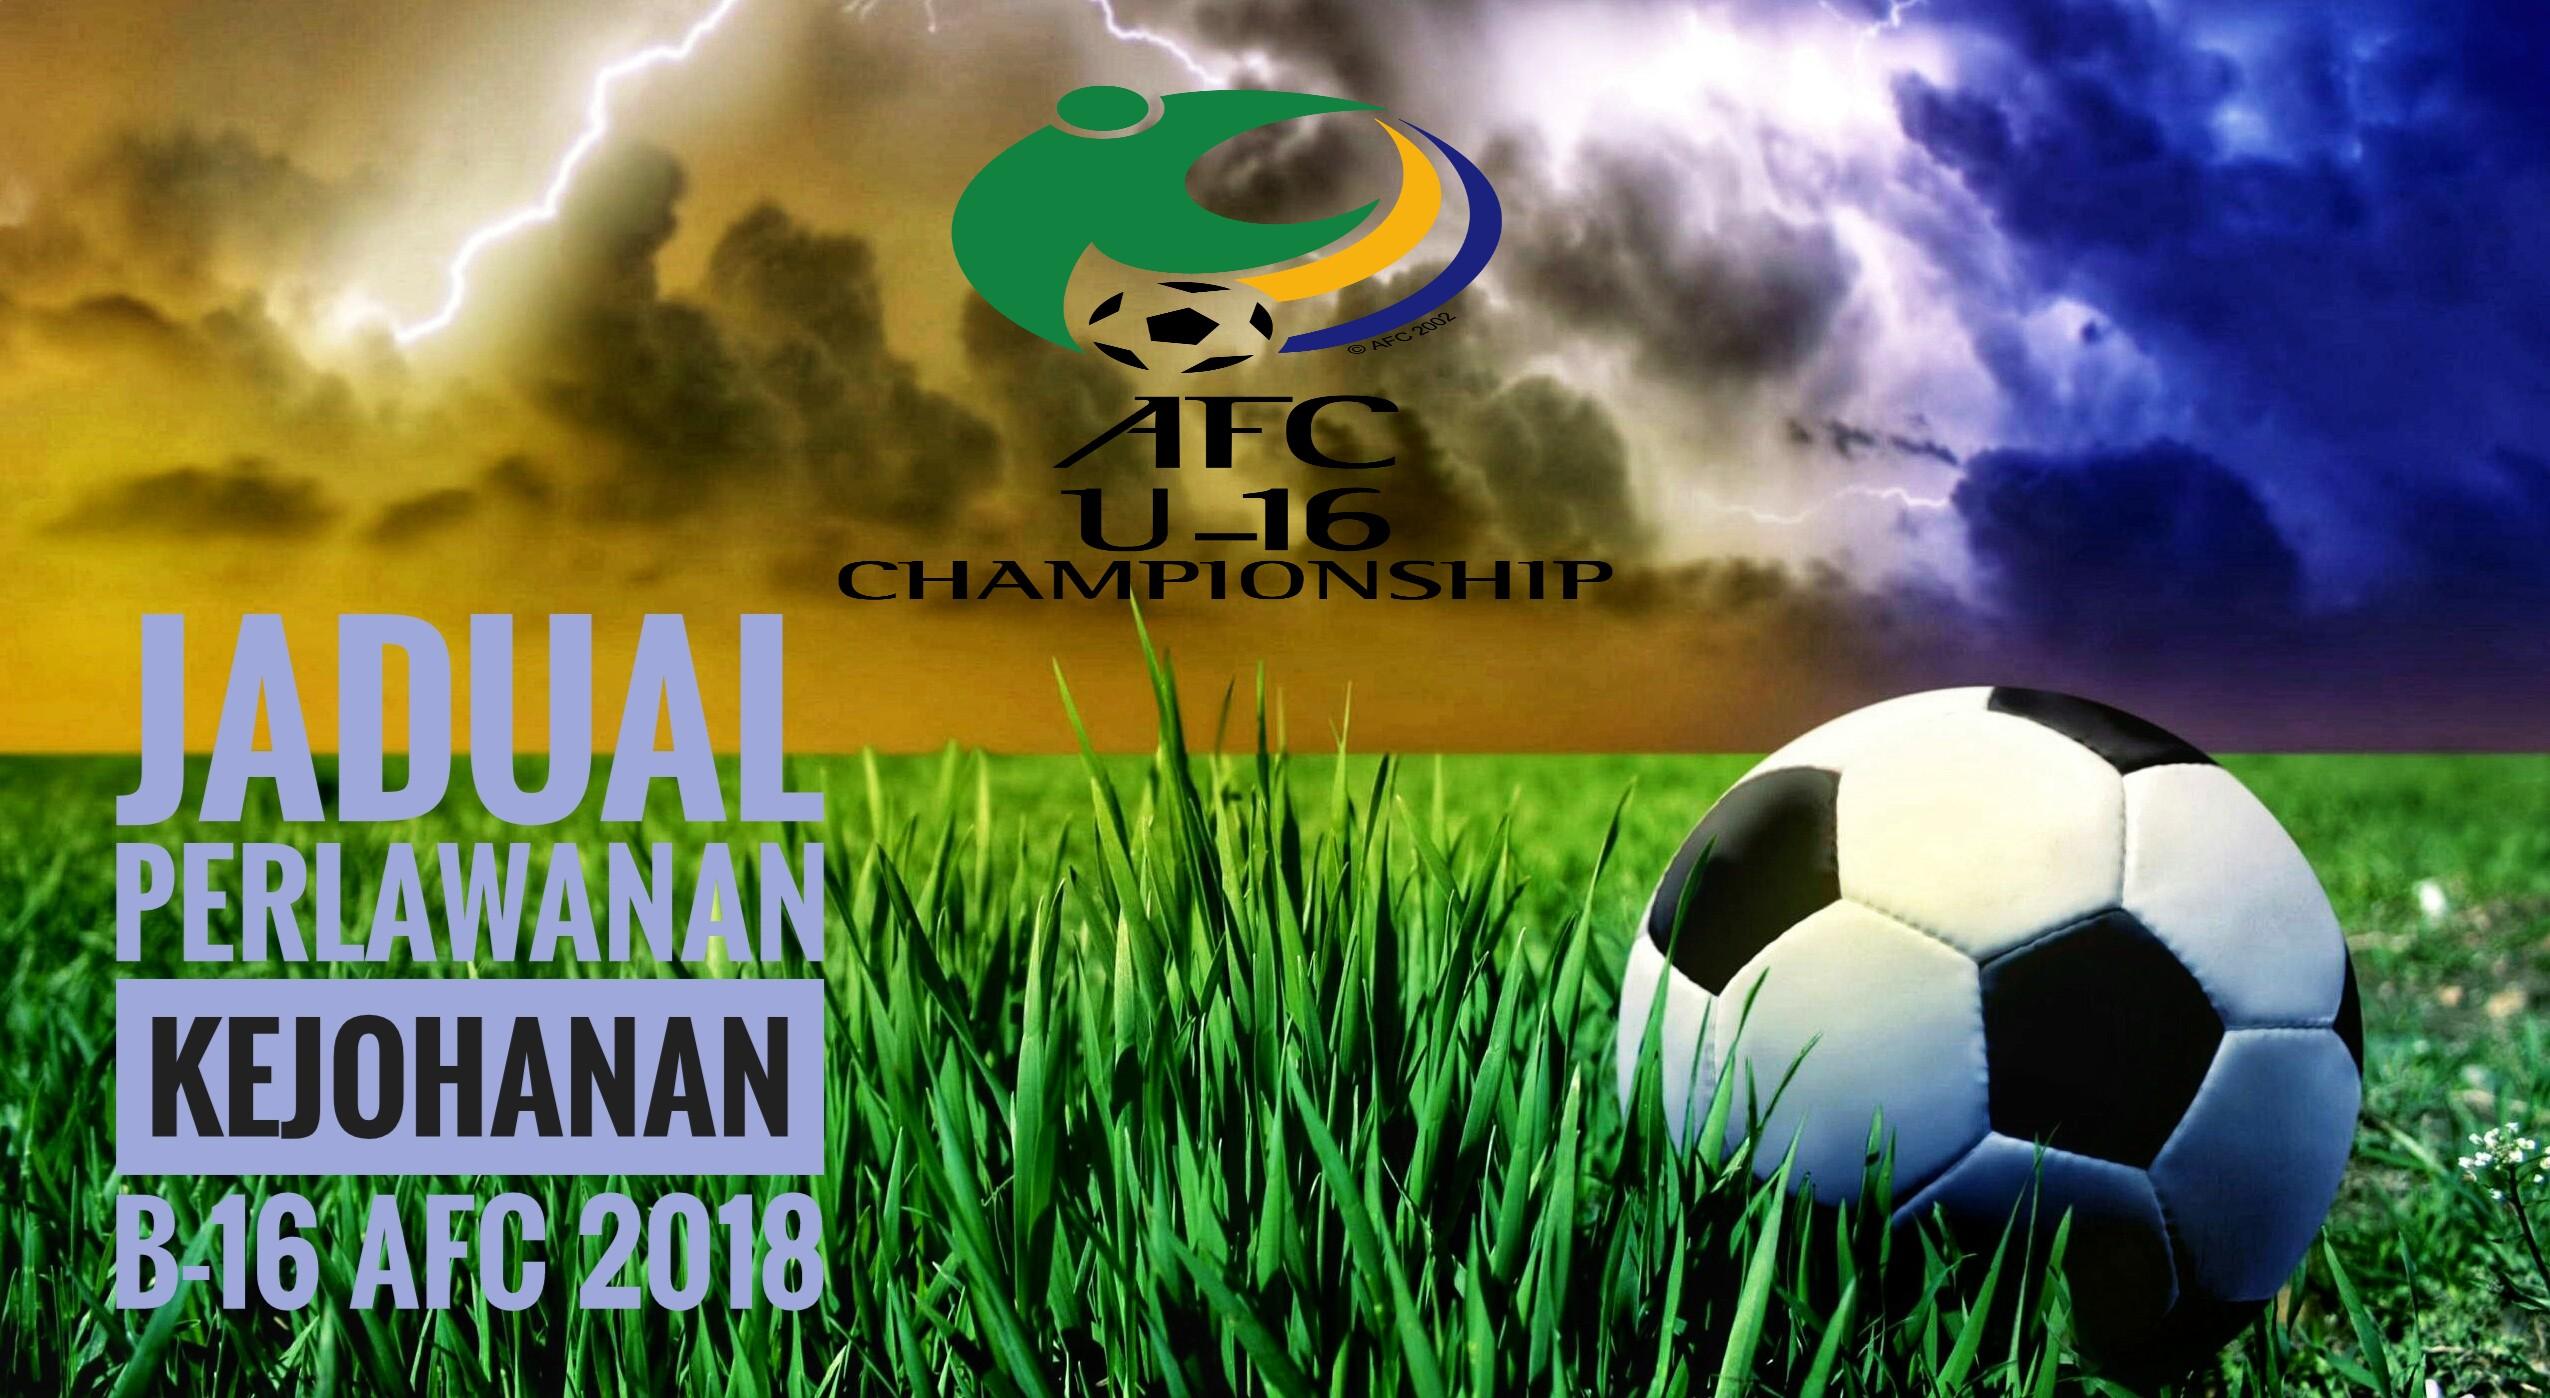 Jadual Perlawanan Kejohanan B-16 AFC 2018